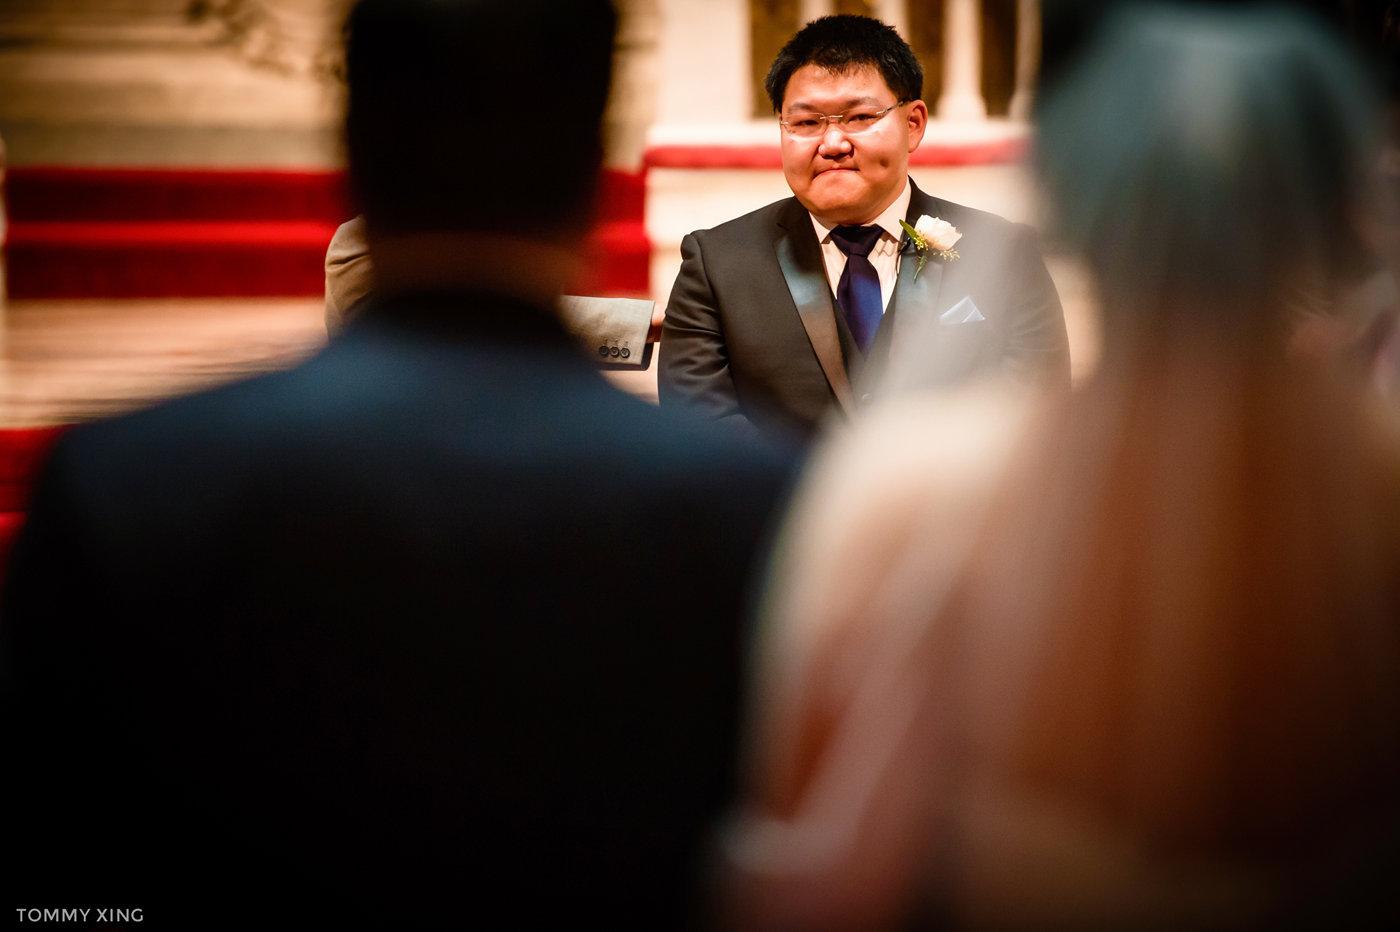 STANFORD MEMORIAL CHURCH WEDDING - Wenjie & Chengcheng - SAN FRANCISCO BAY AREA 斯坦福教堂婚礼跟拍 - 洛杉矶婚礼婚纱照摄影师 Tommy Xing Photography077.jpg